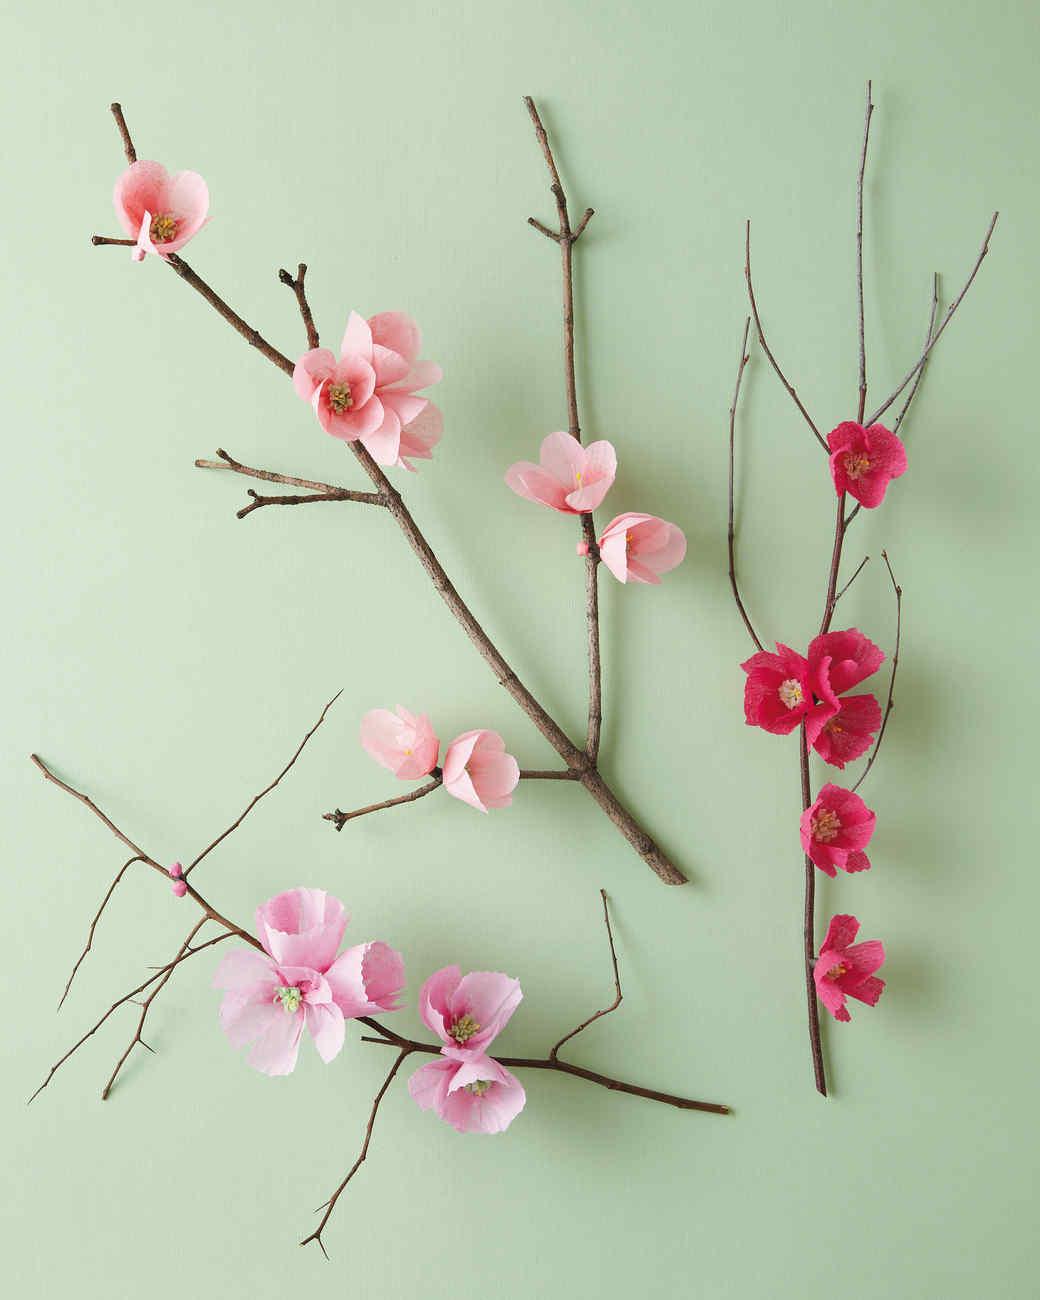 How to Make a Origami Cherry Blossom | 1300x1040